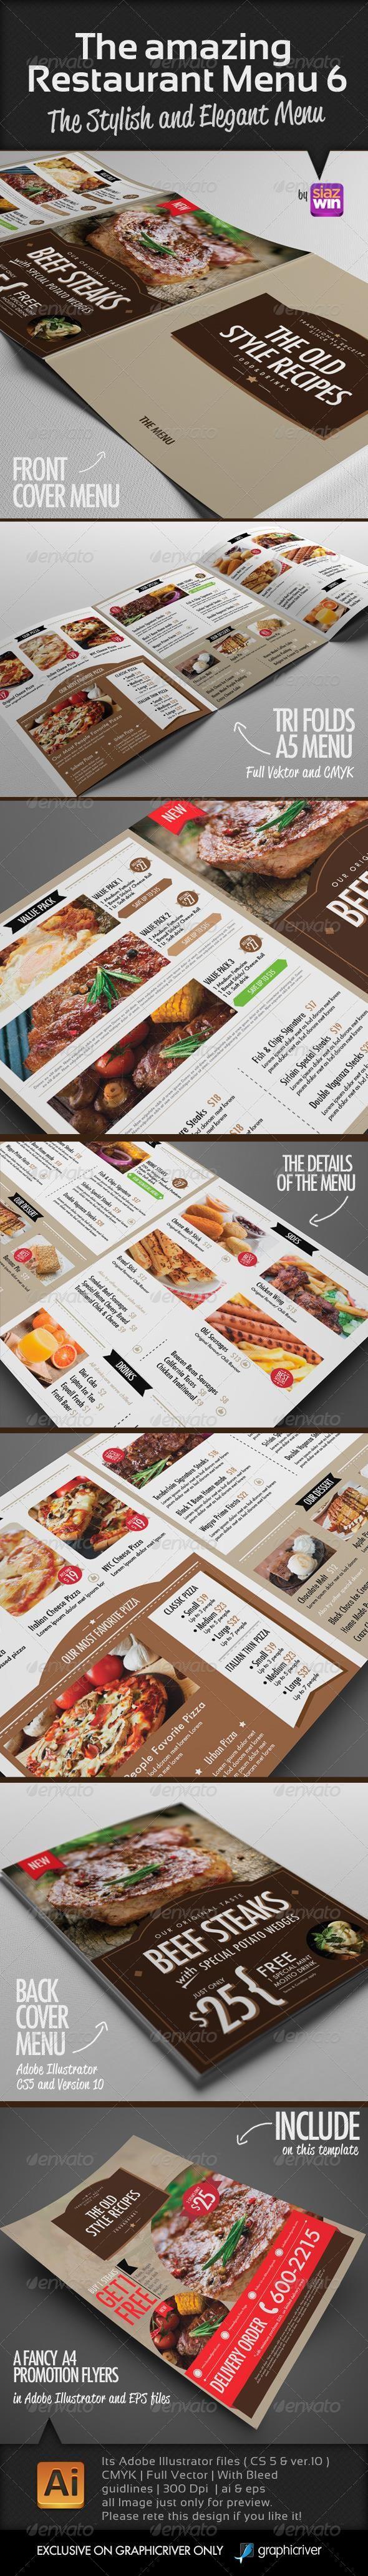 White apron menu warrington - The Amazing Restaurant Menu 6